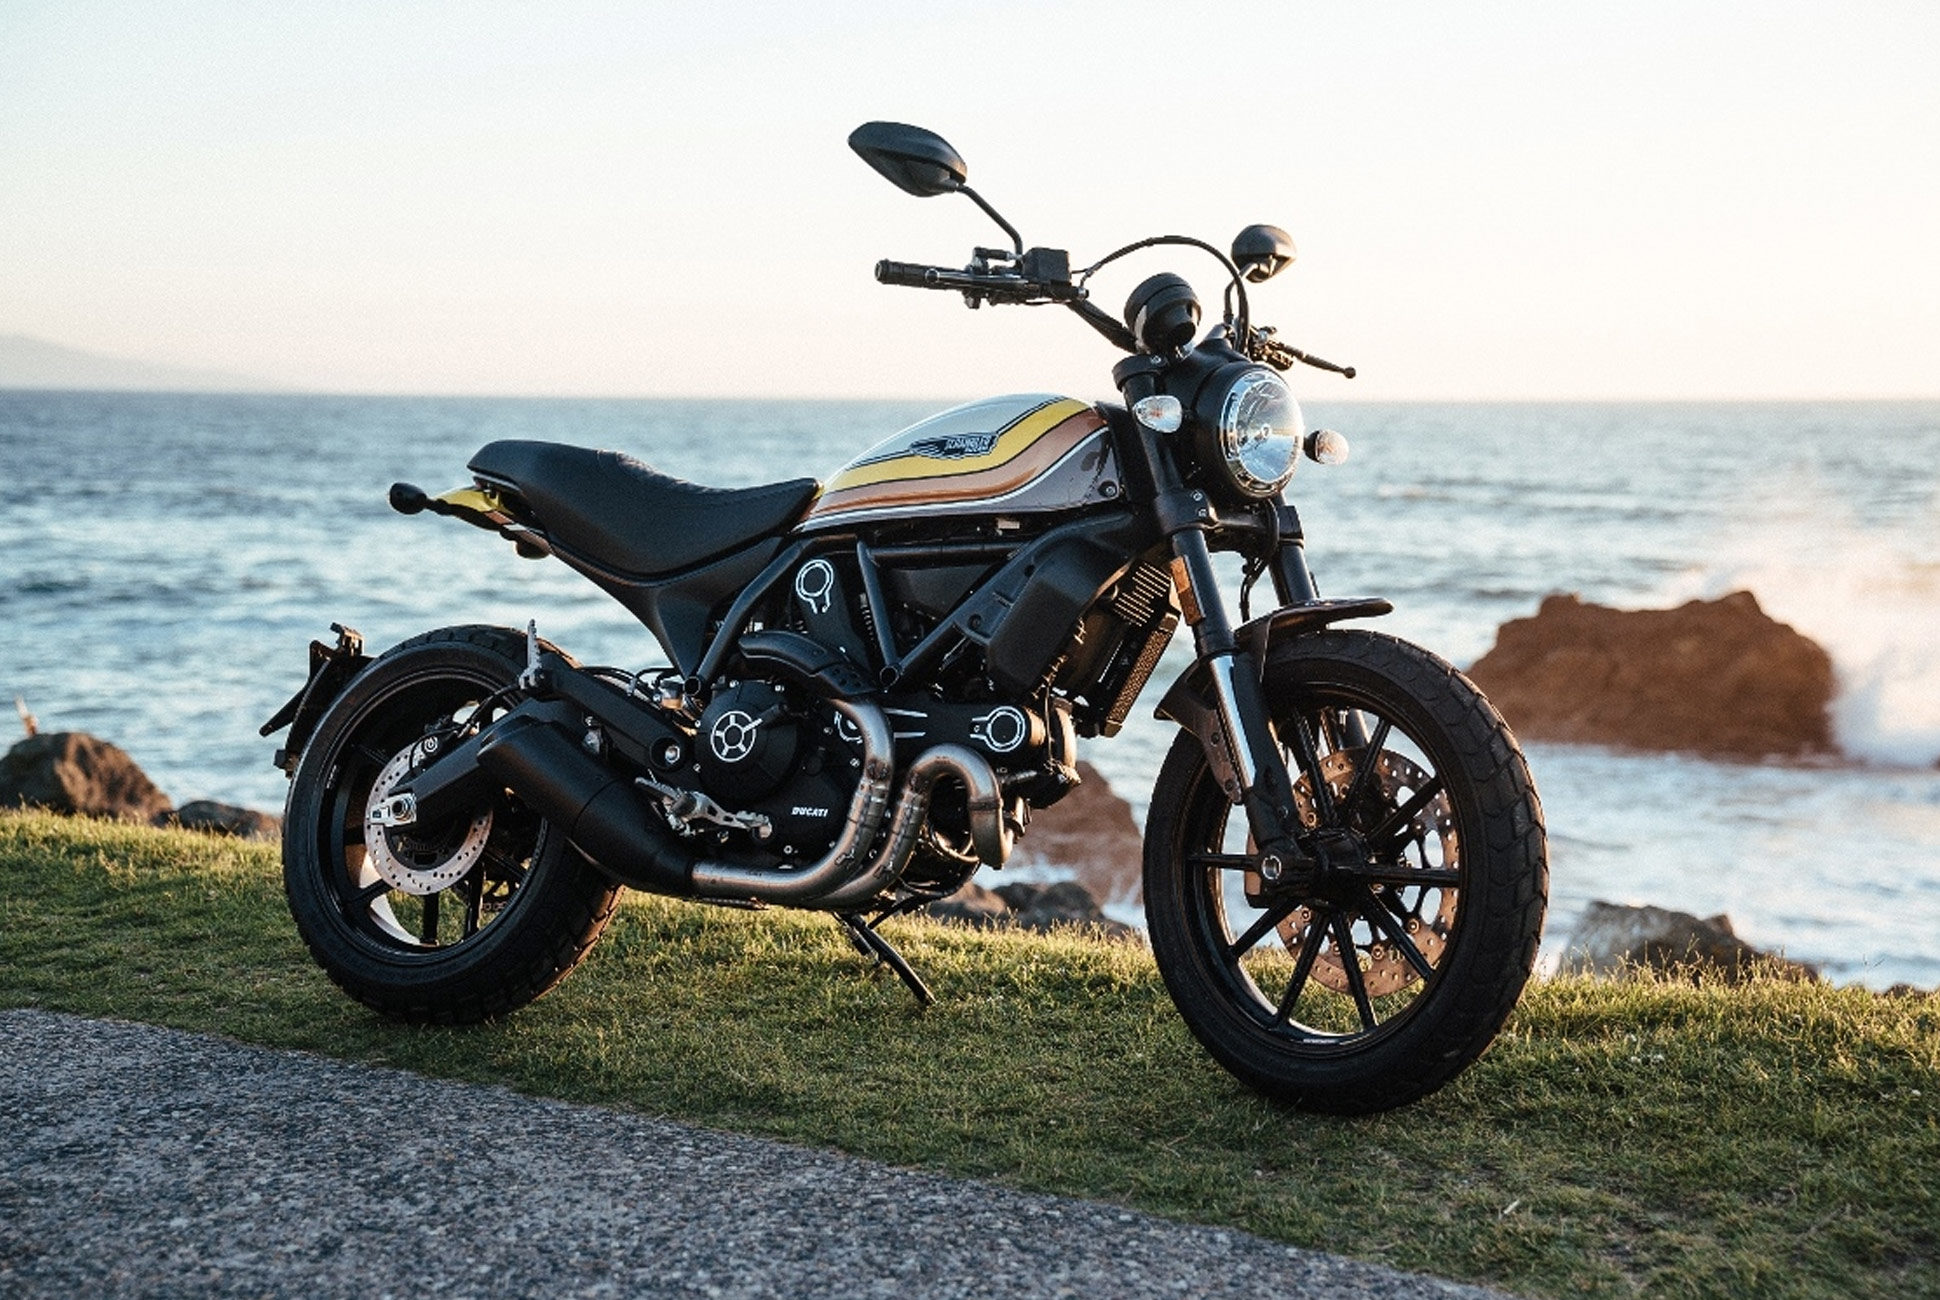 Ducati-Scrambler-gear-patrol-1-1940x1300.jpg